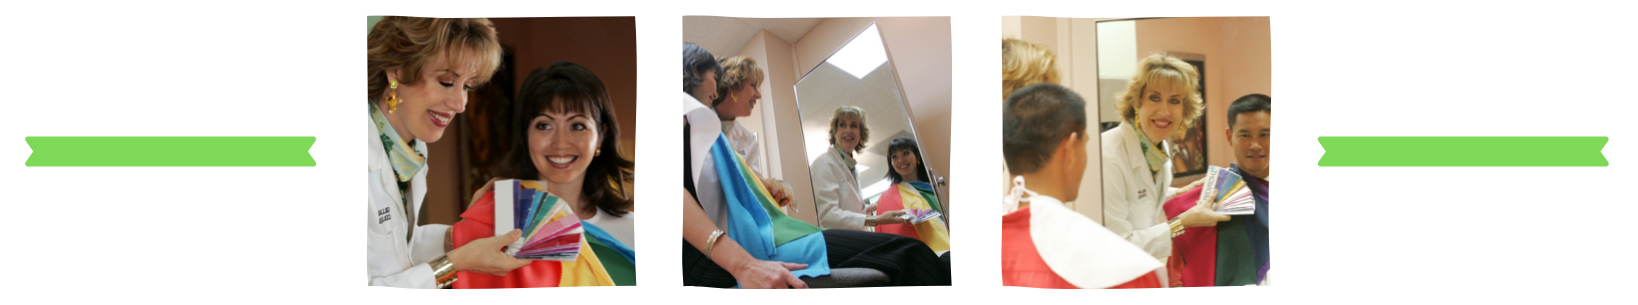 Three Image Gillian Armour Color Analysis.png